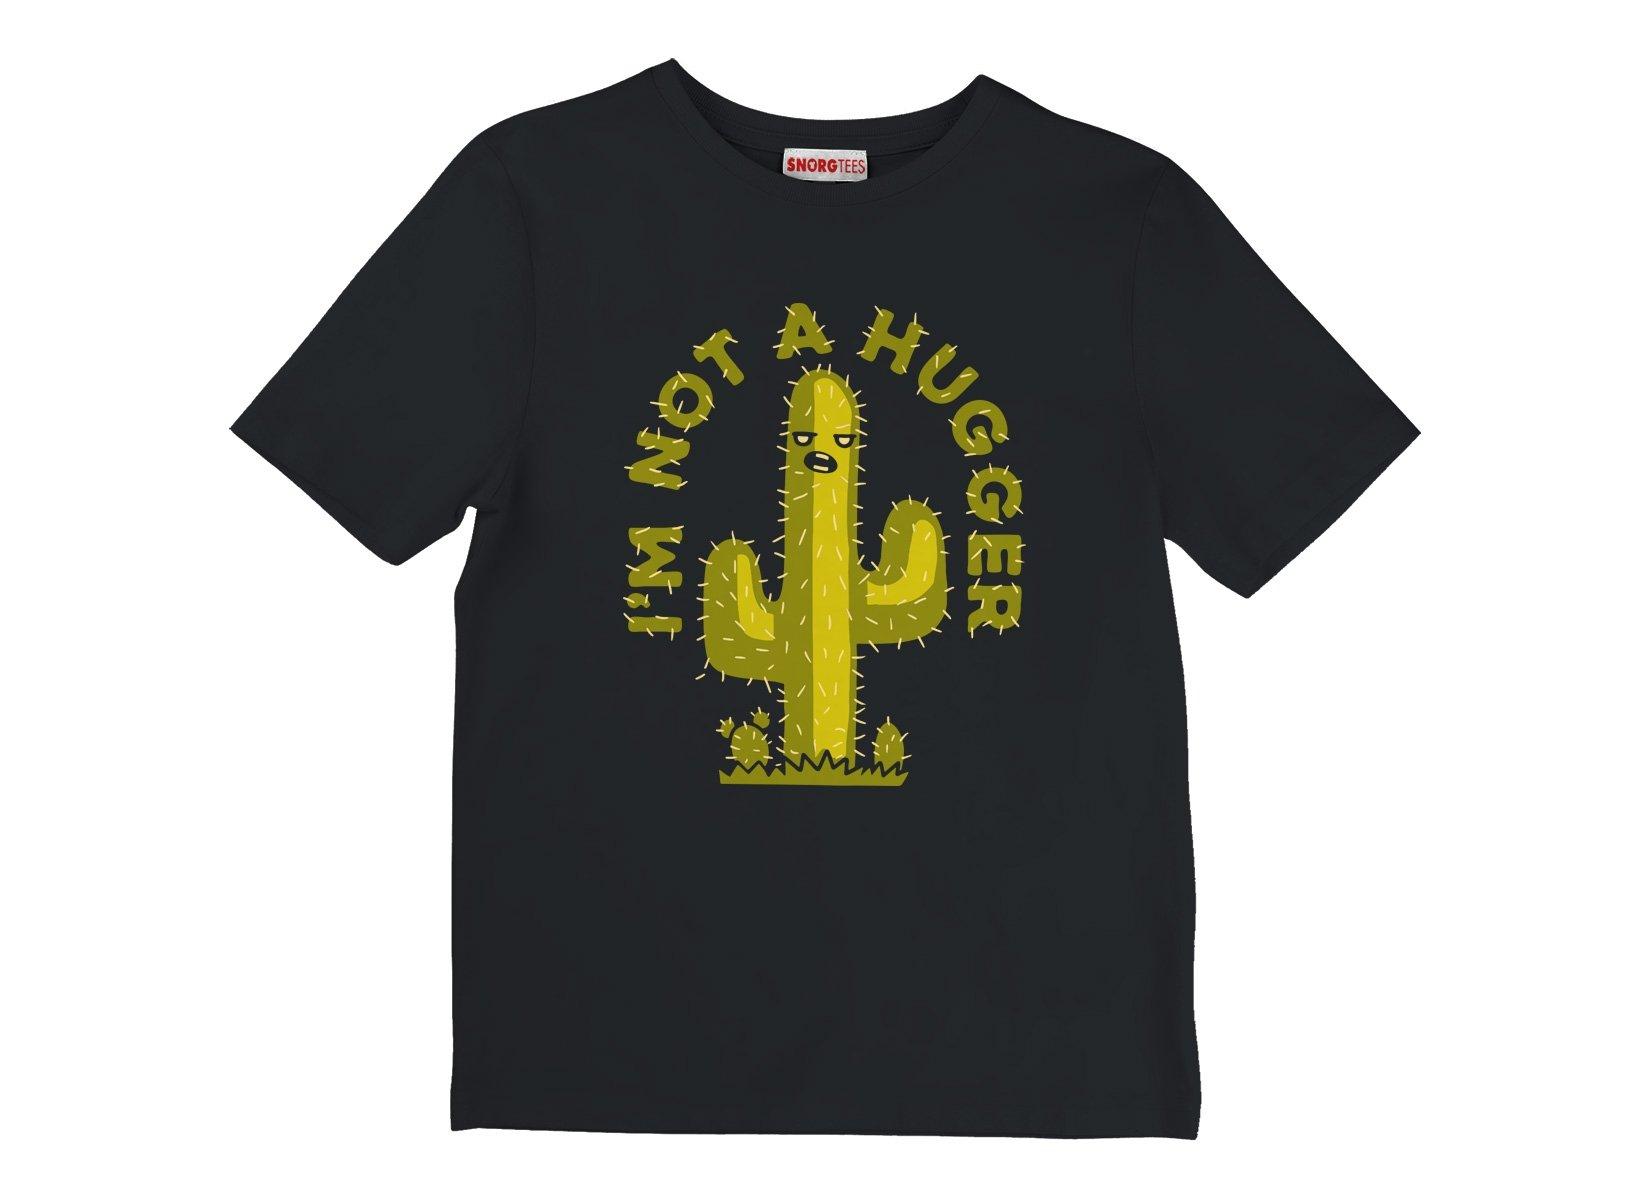 I'm Not A Hugger on Kids T-Shirt